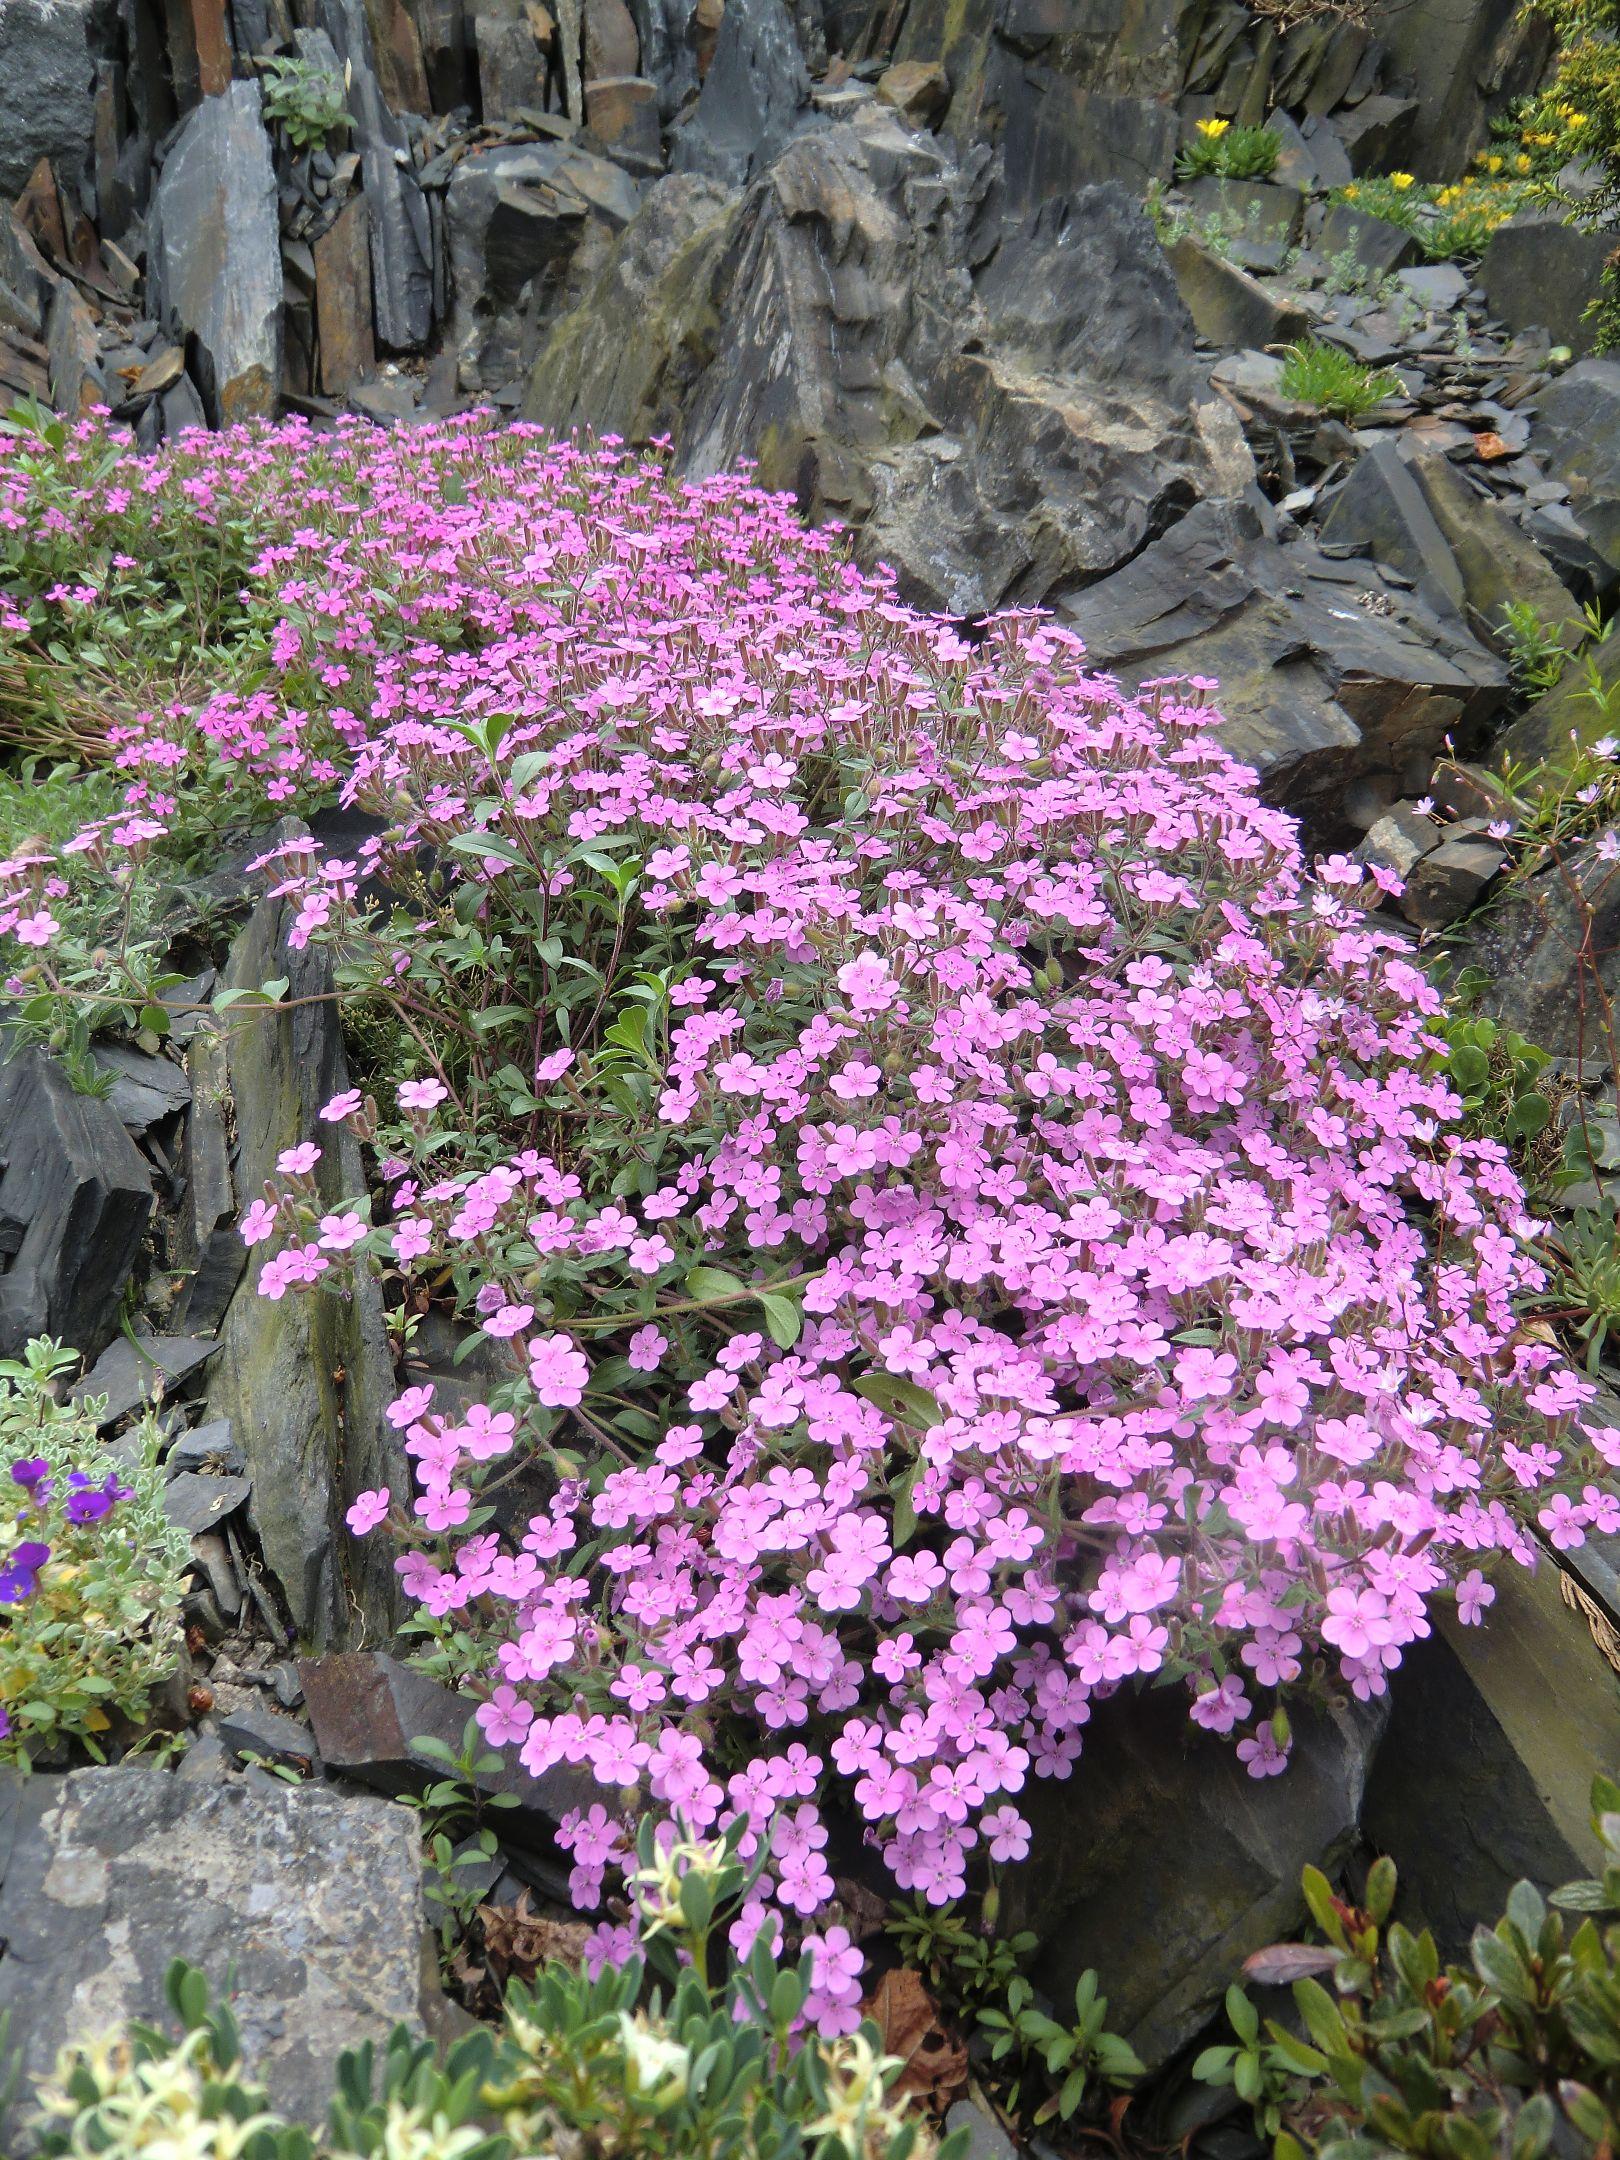 Wwwalpine Seedscom List Of Rock Alpine Seeds Beginning With S